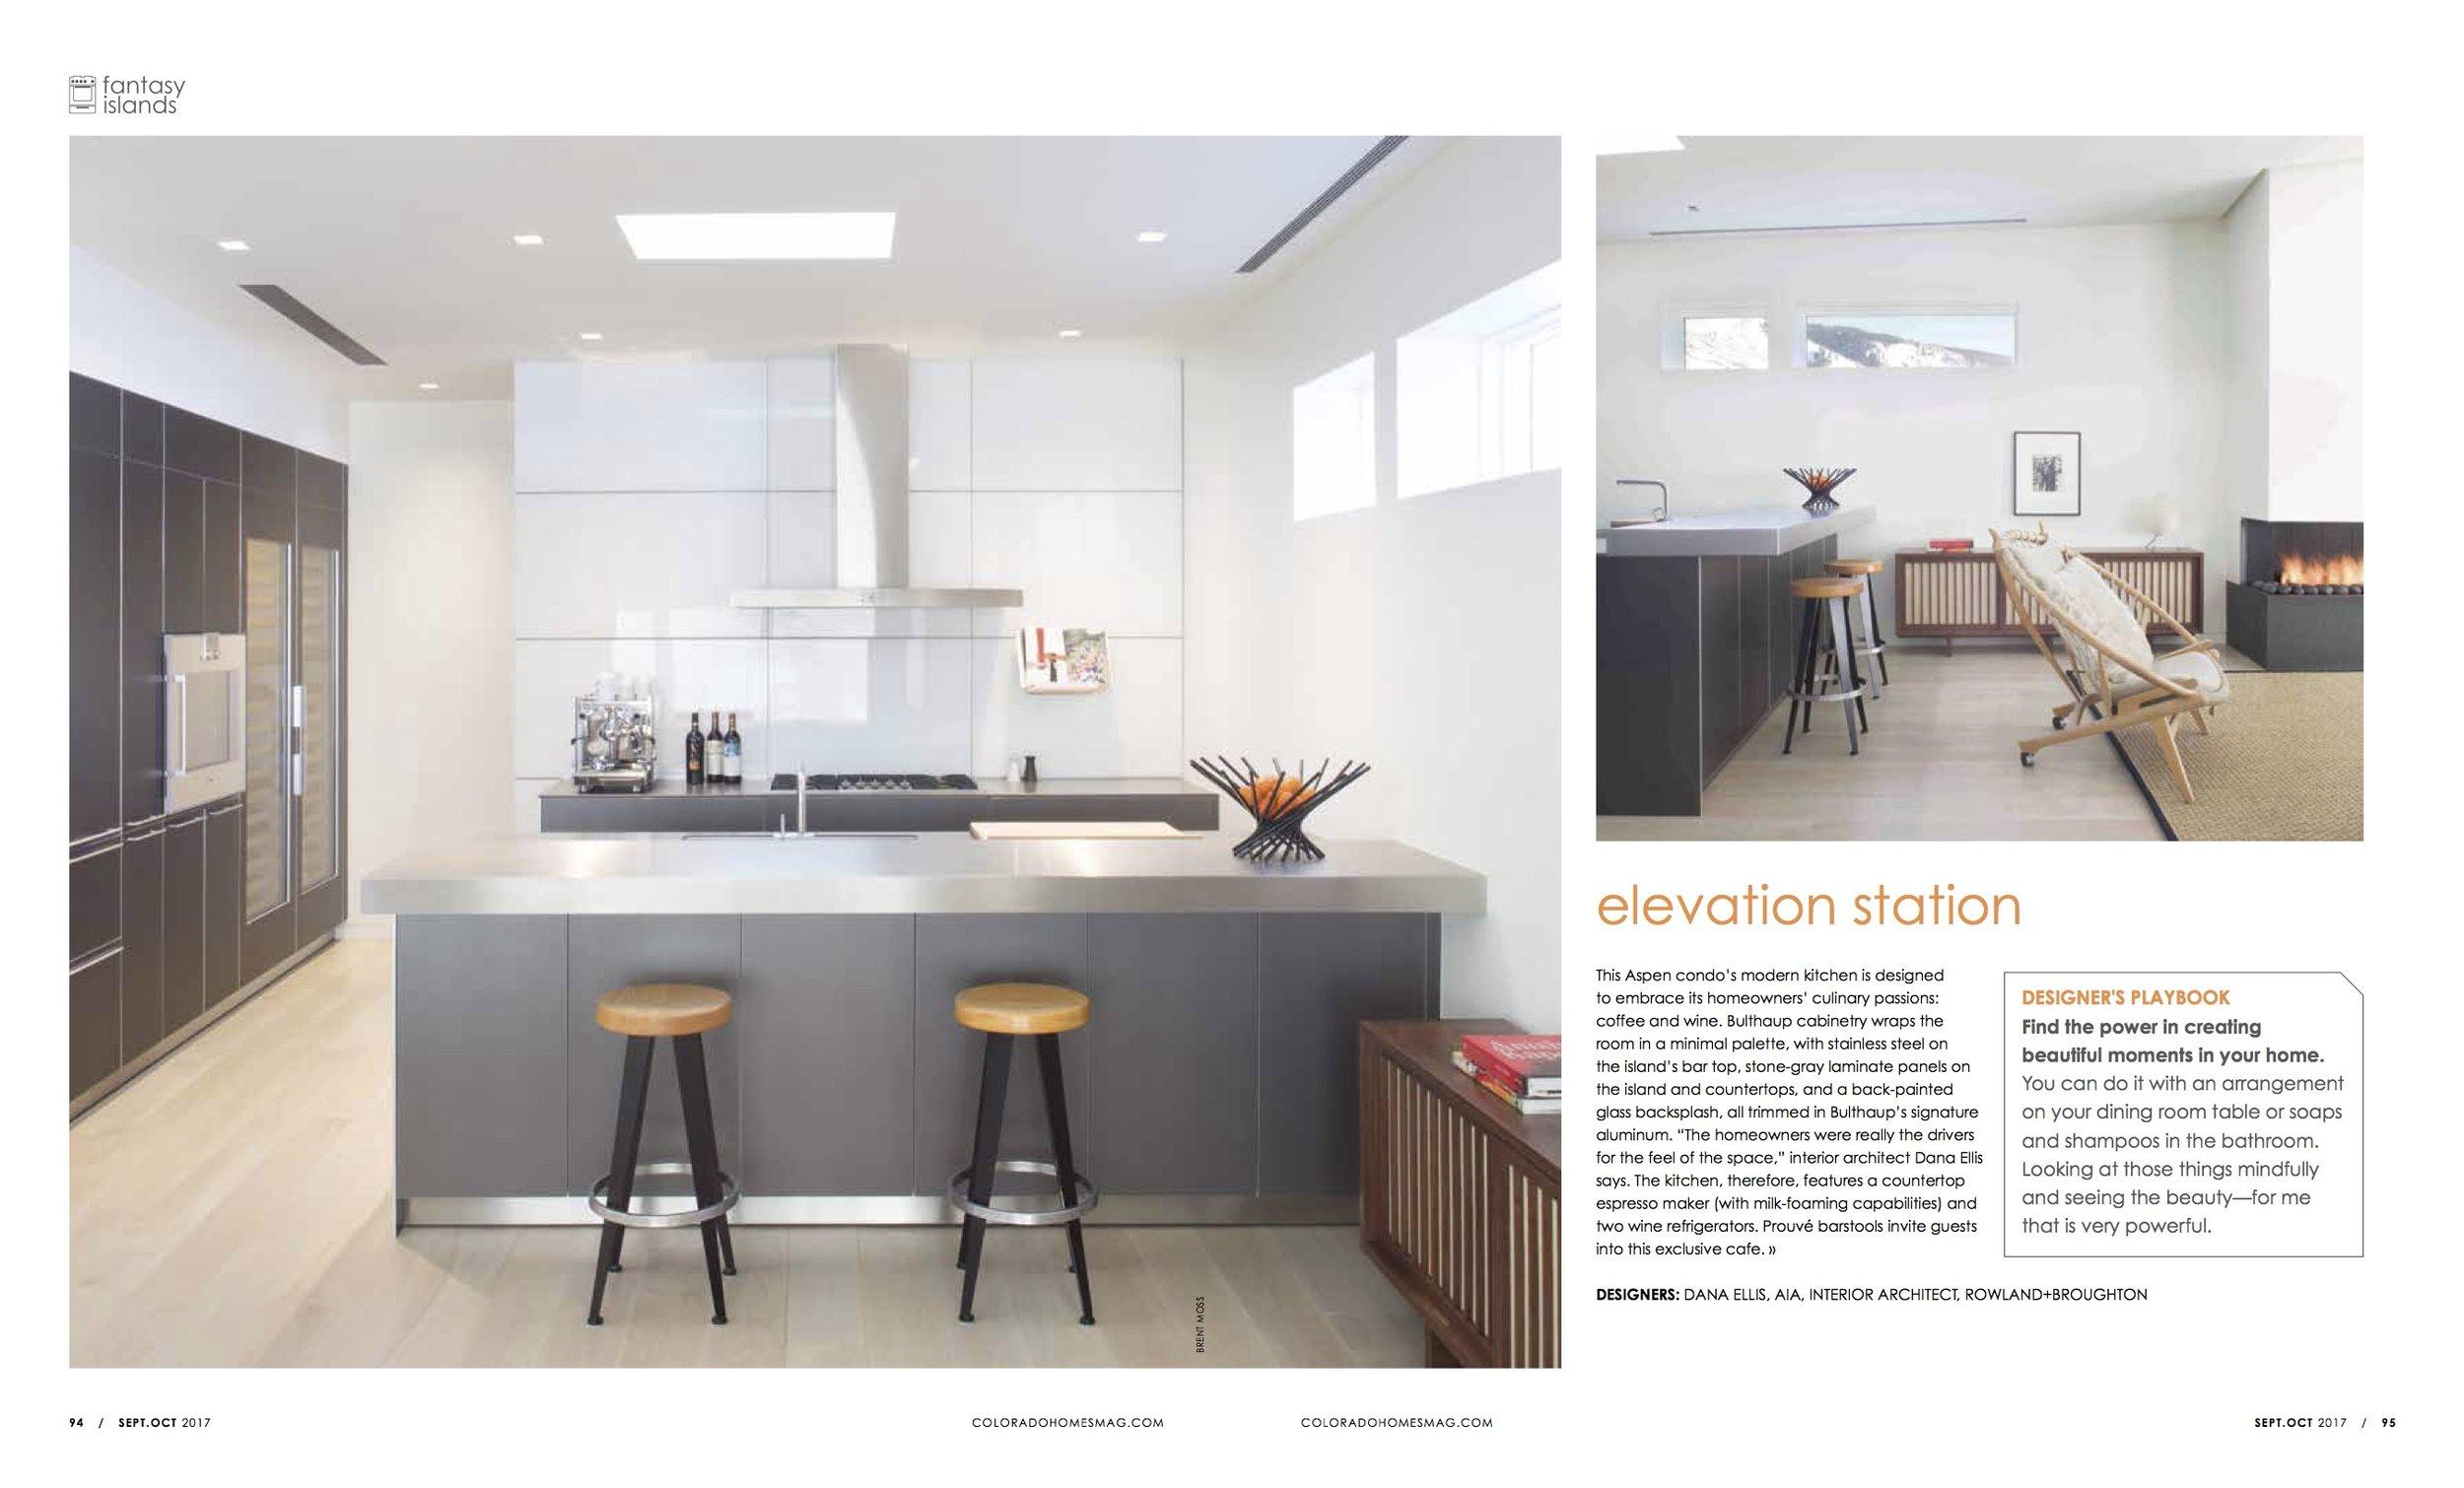 kitchens sp3.jpg